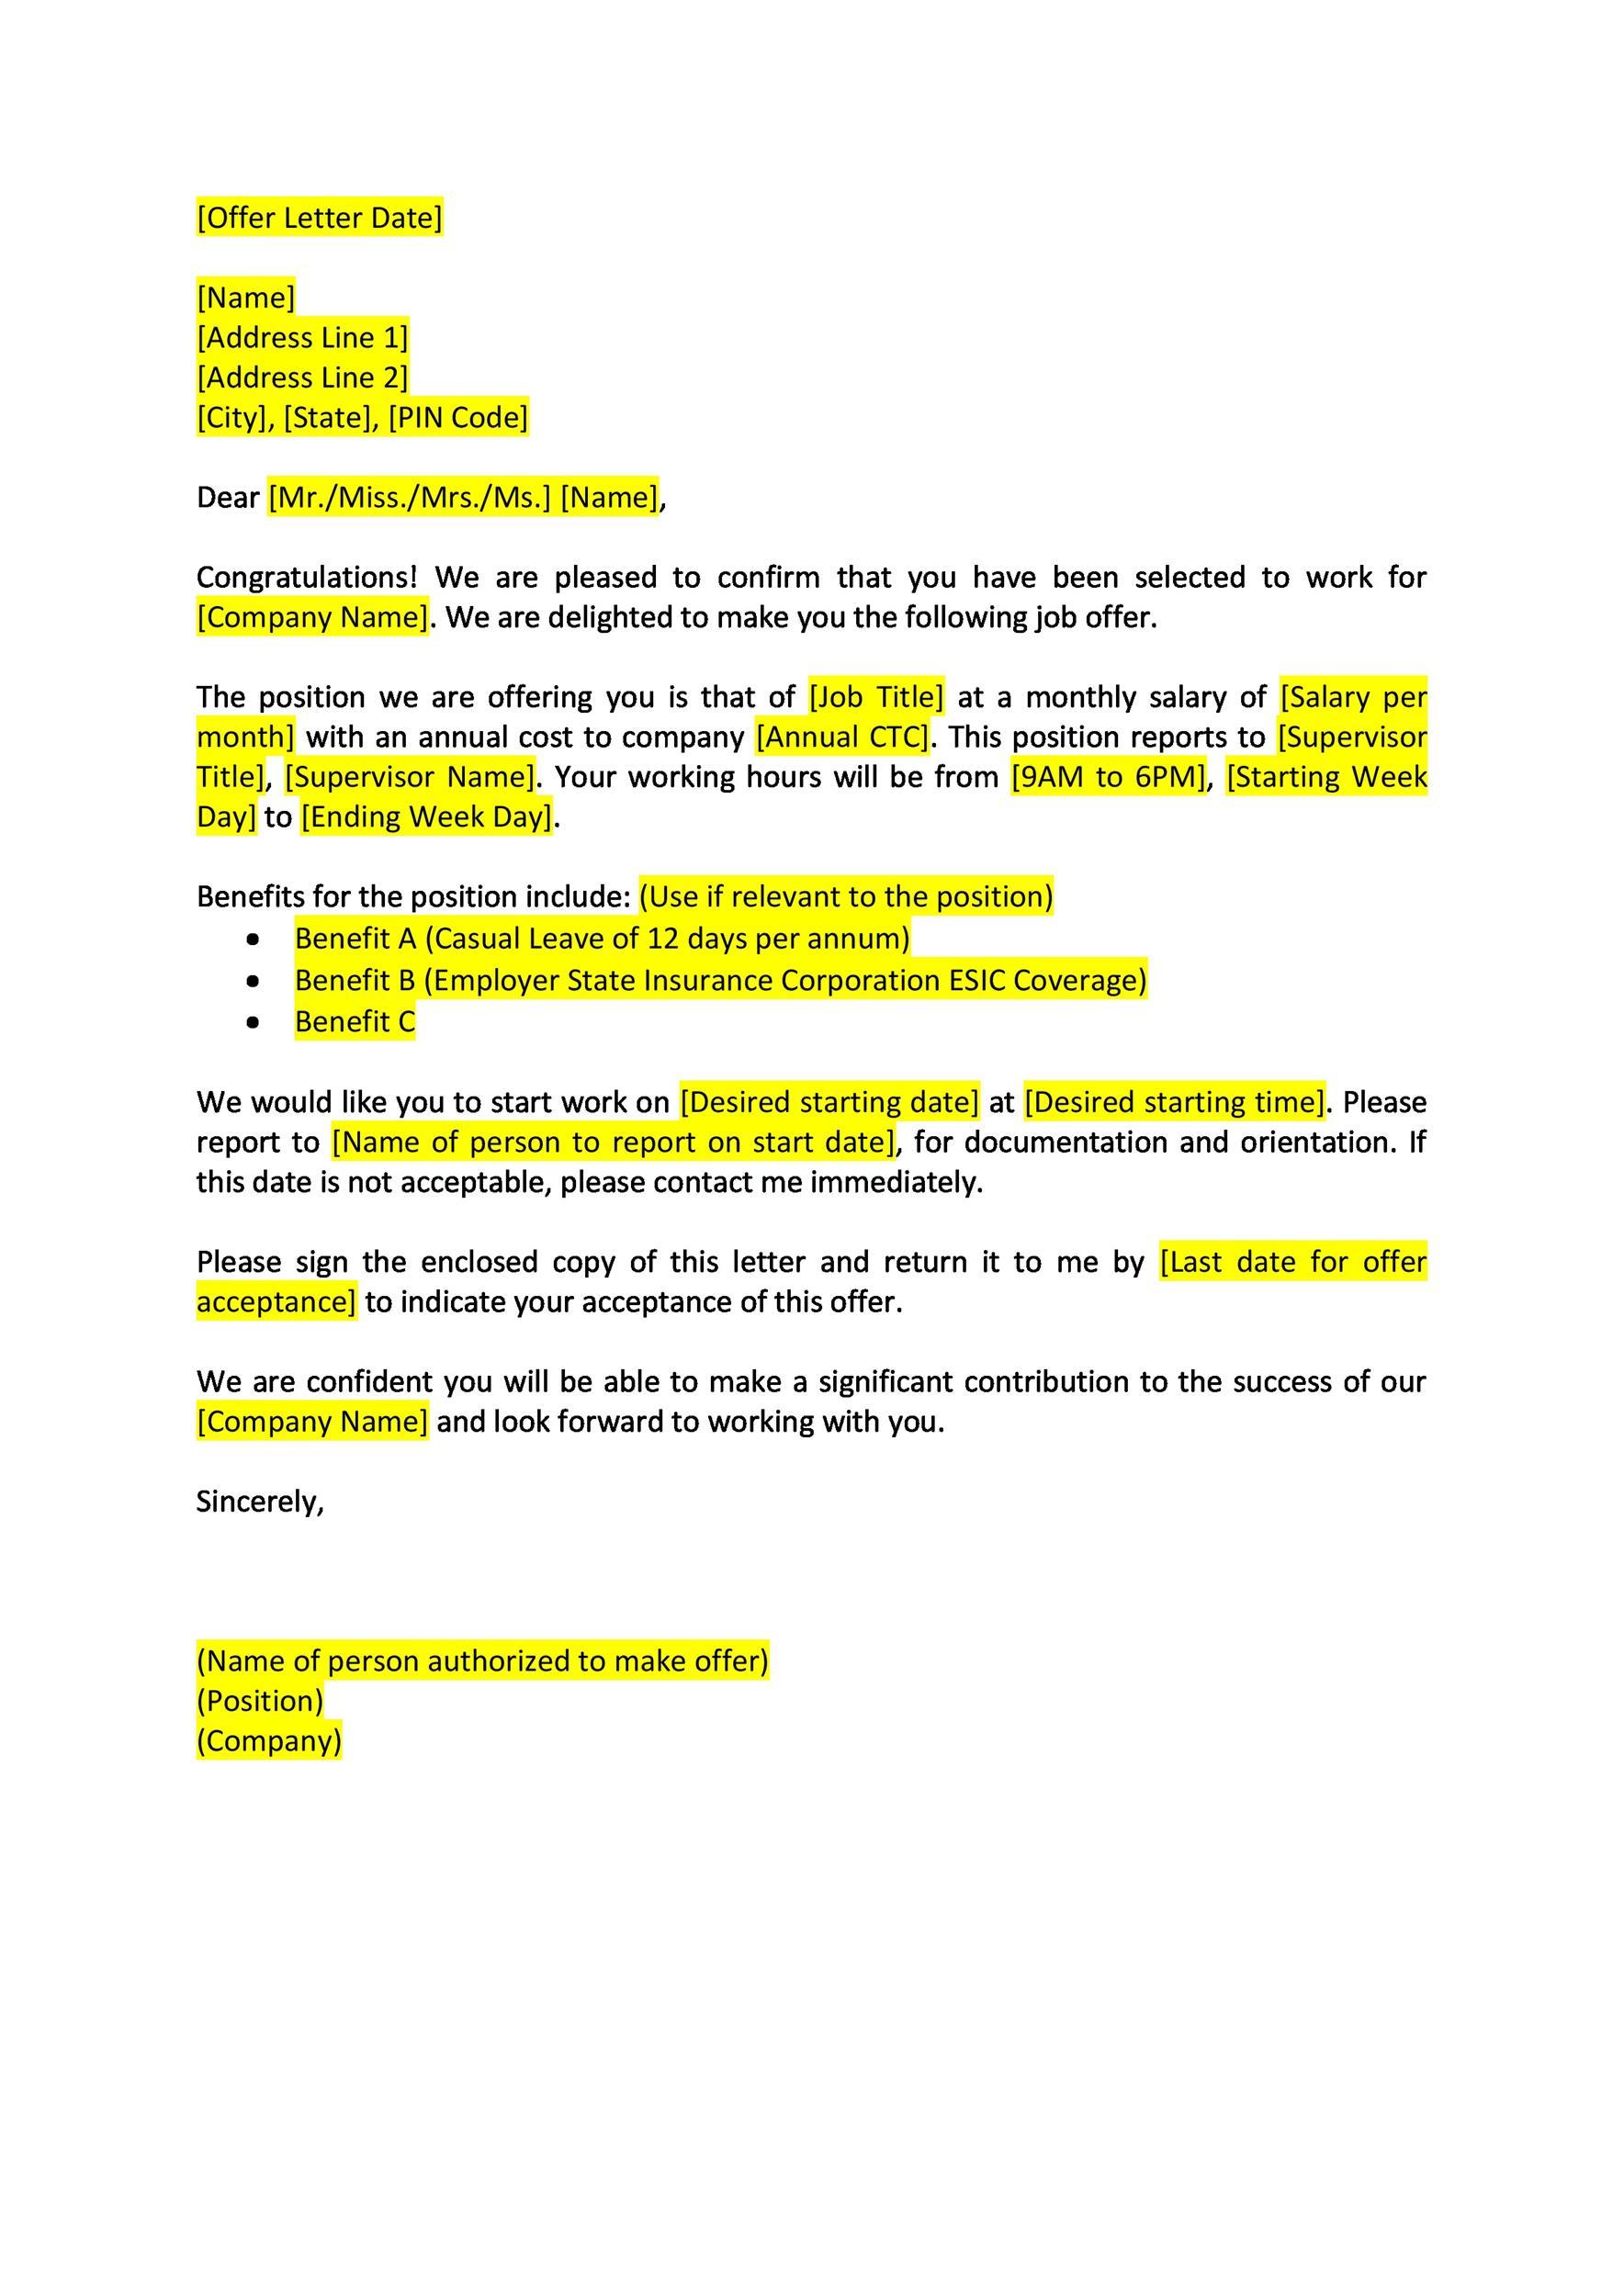 Free Offer letter 42